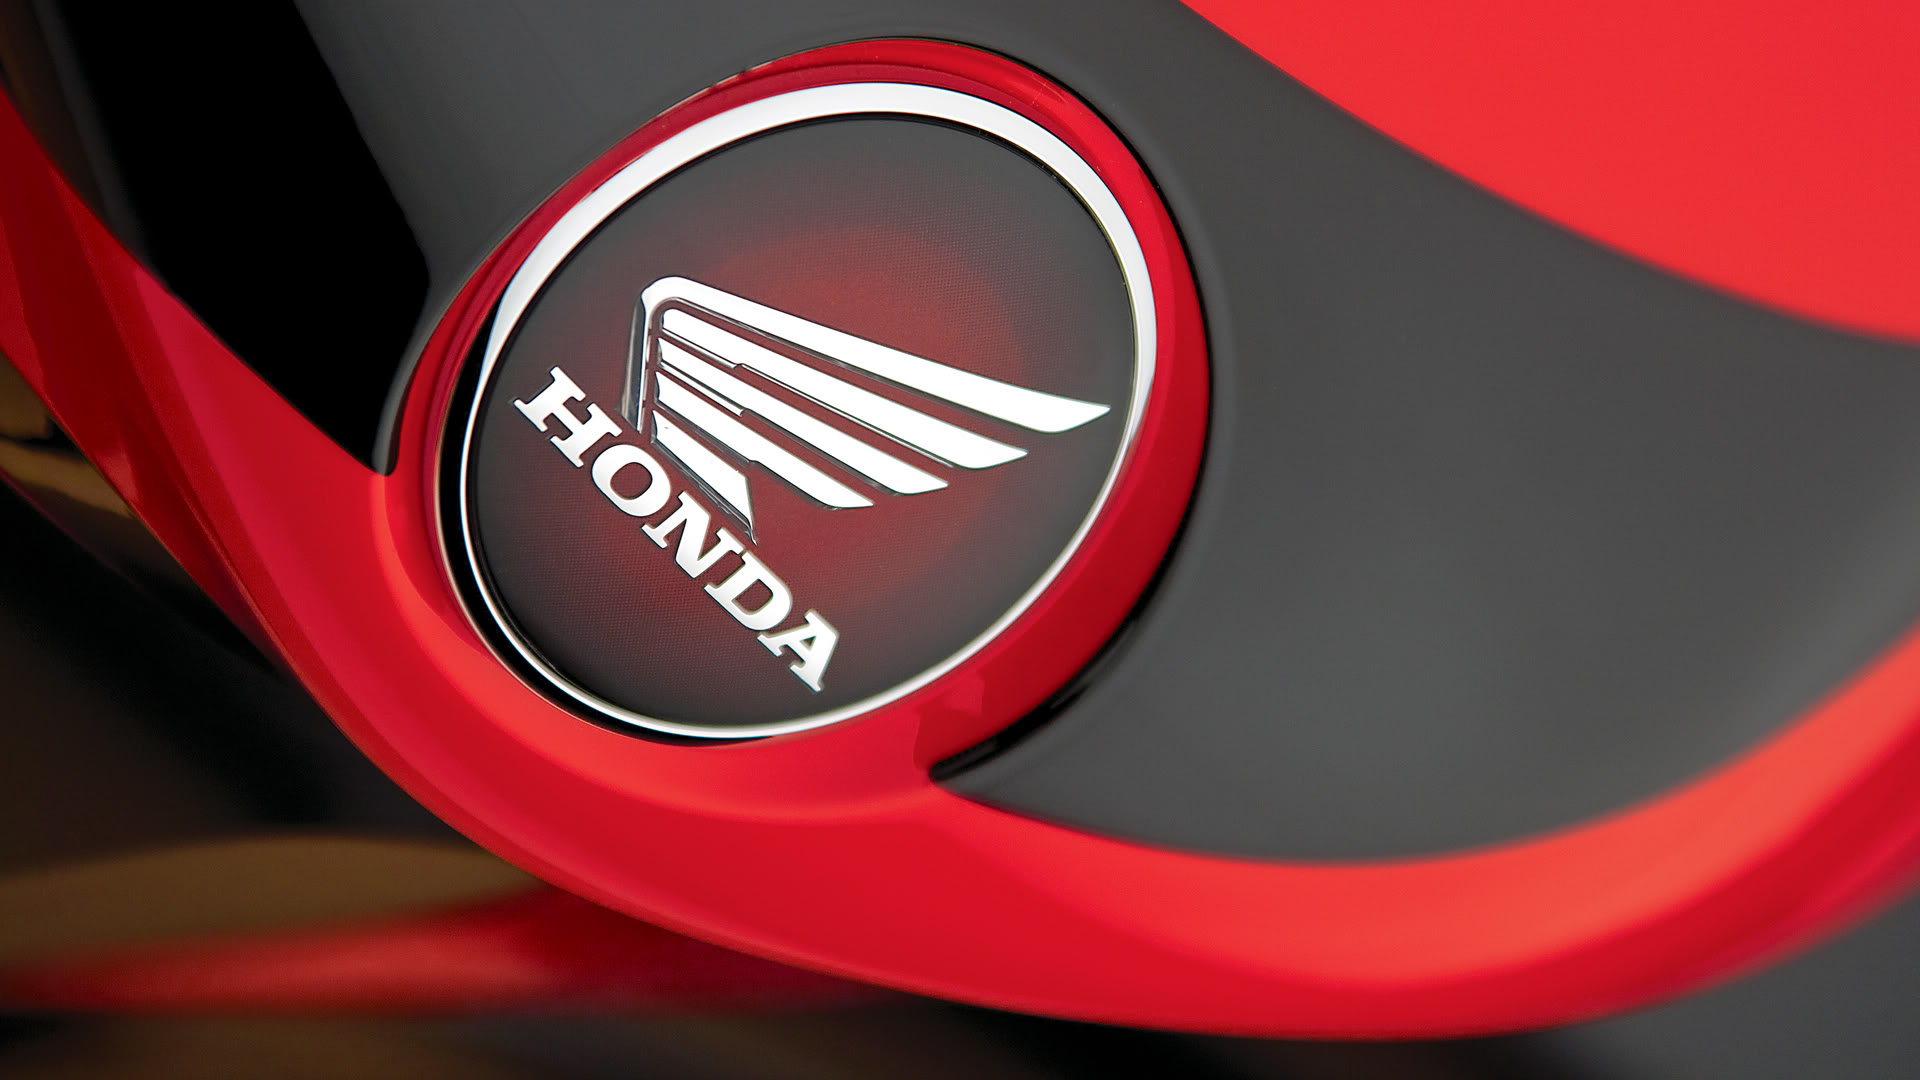 HD Honda Backgrounds Honda Wallpaper Images For Download 1920x1080